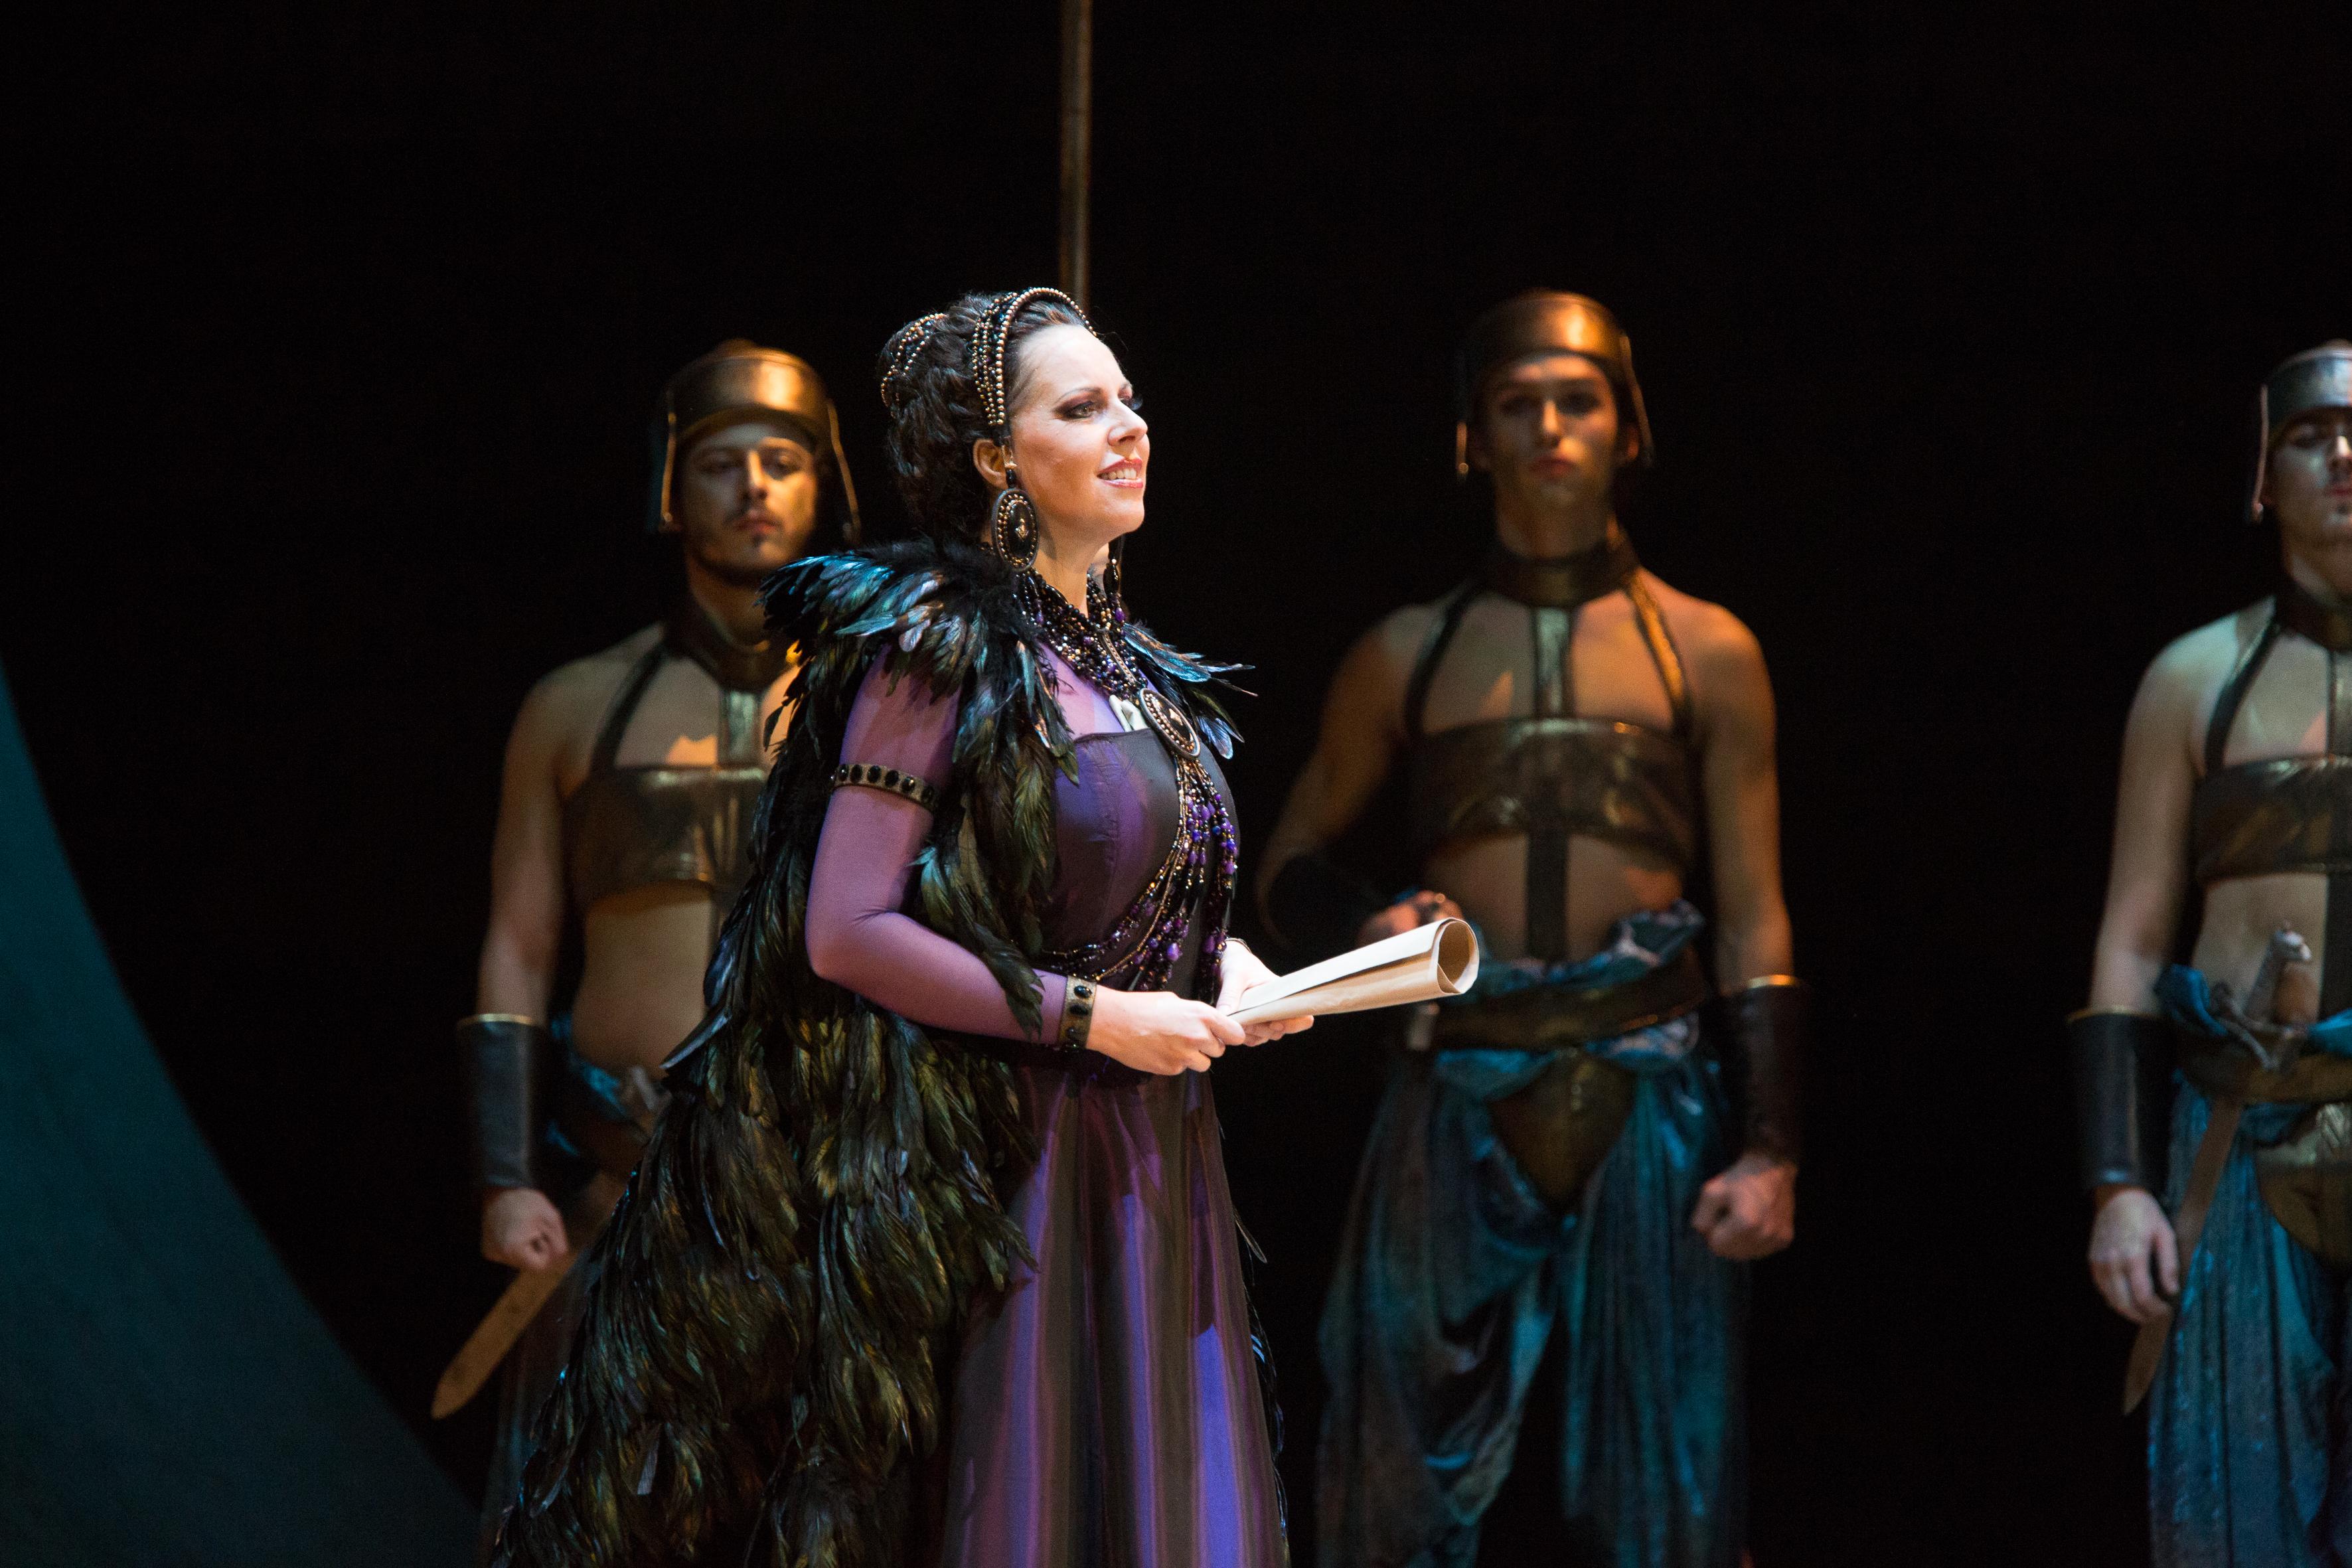 Nabucco - Teatro Verdi di Trieste 2019